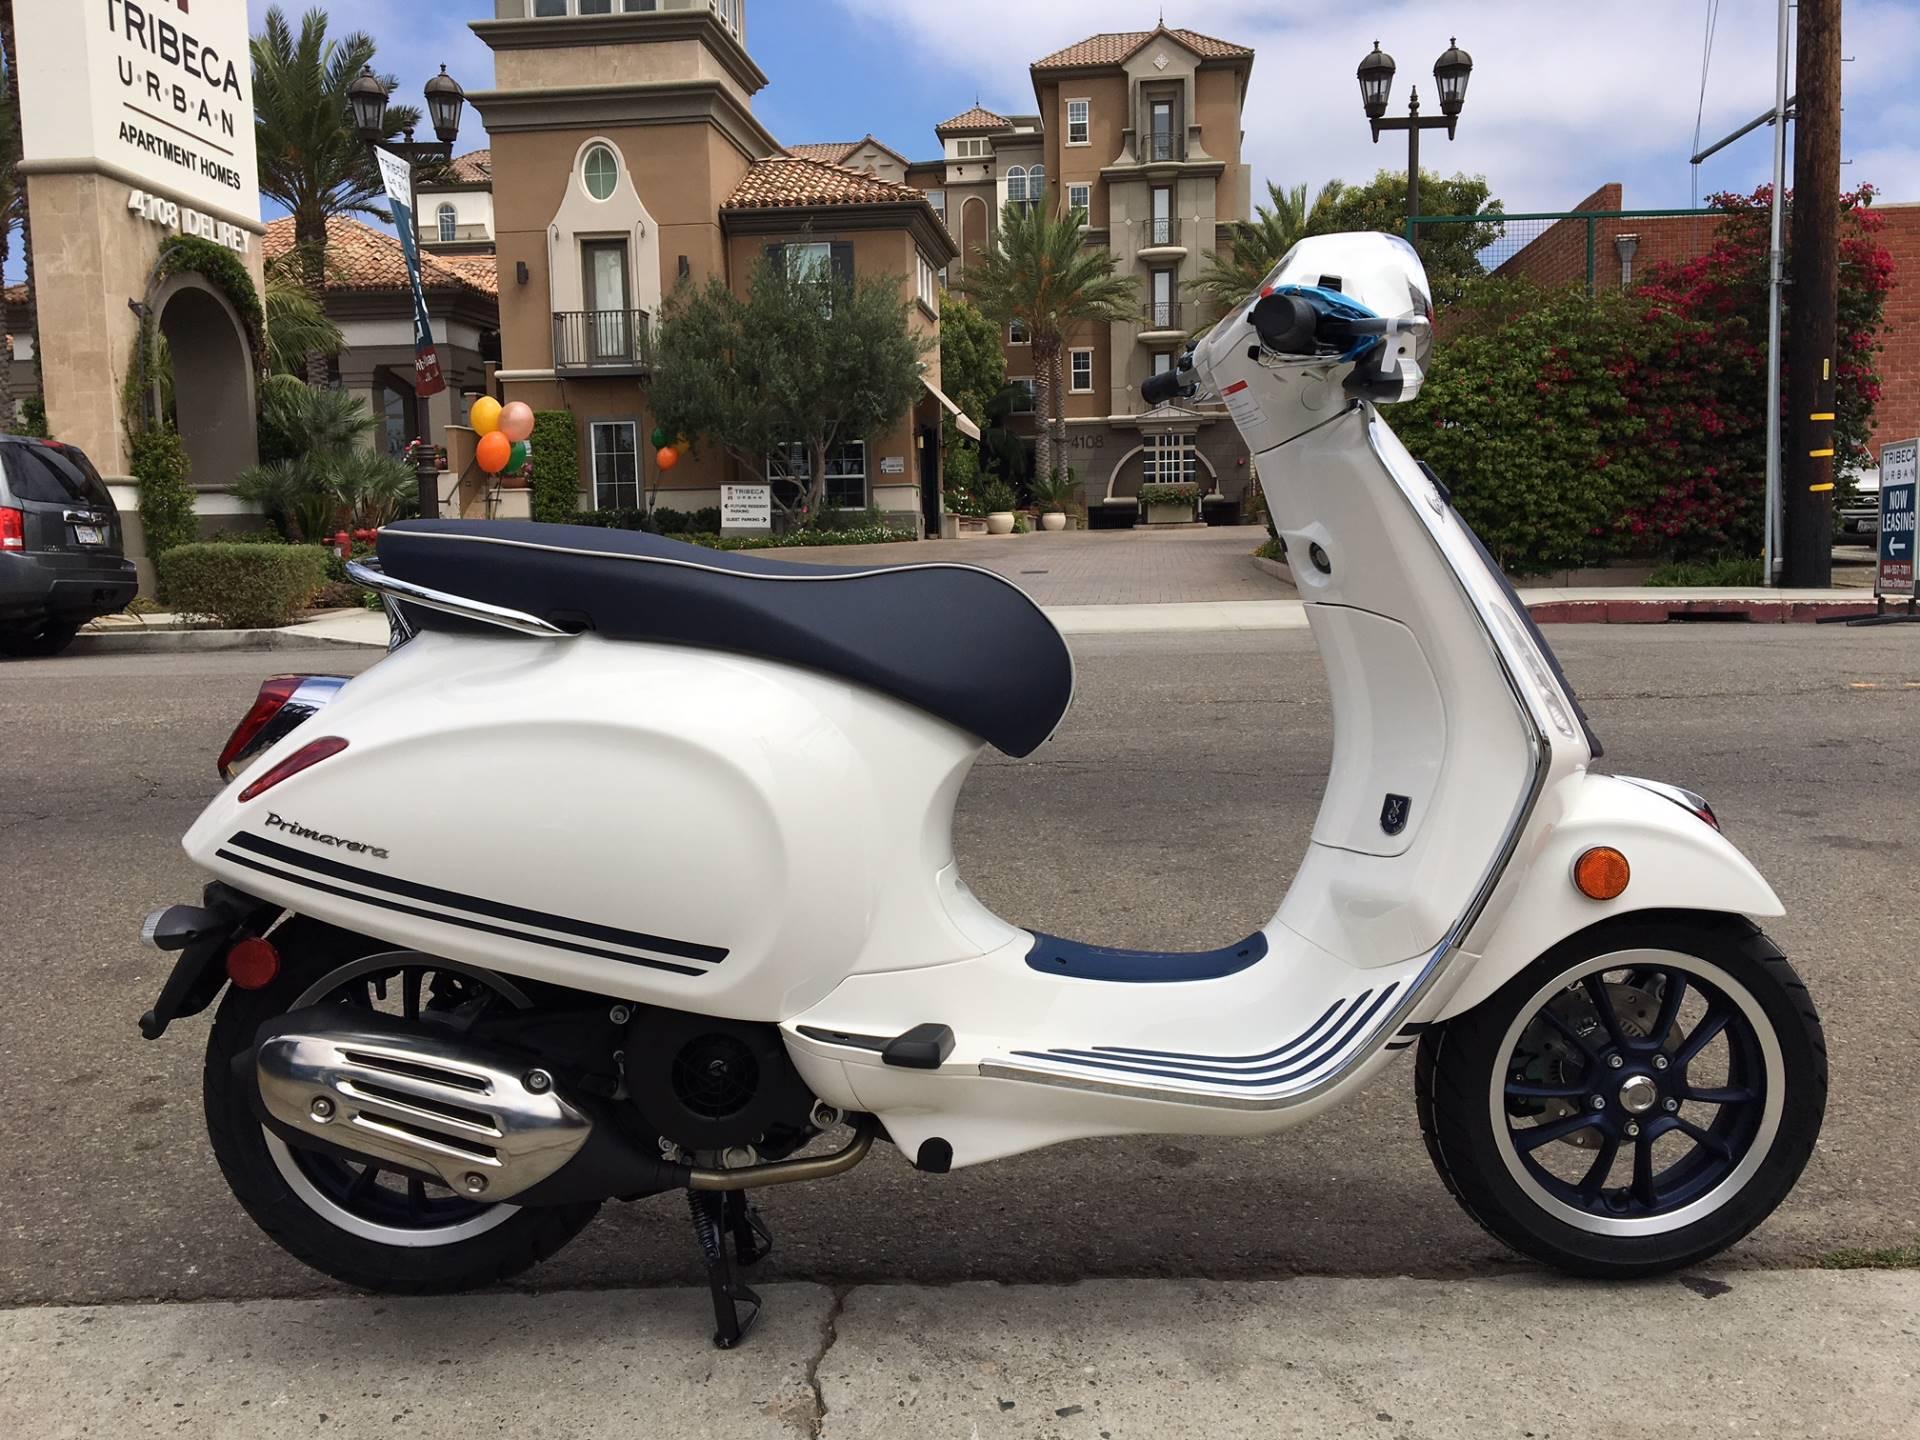 2019 Vespa Primavera 150 Yacht Club Scooters Marina Del Rey California